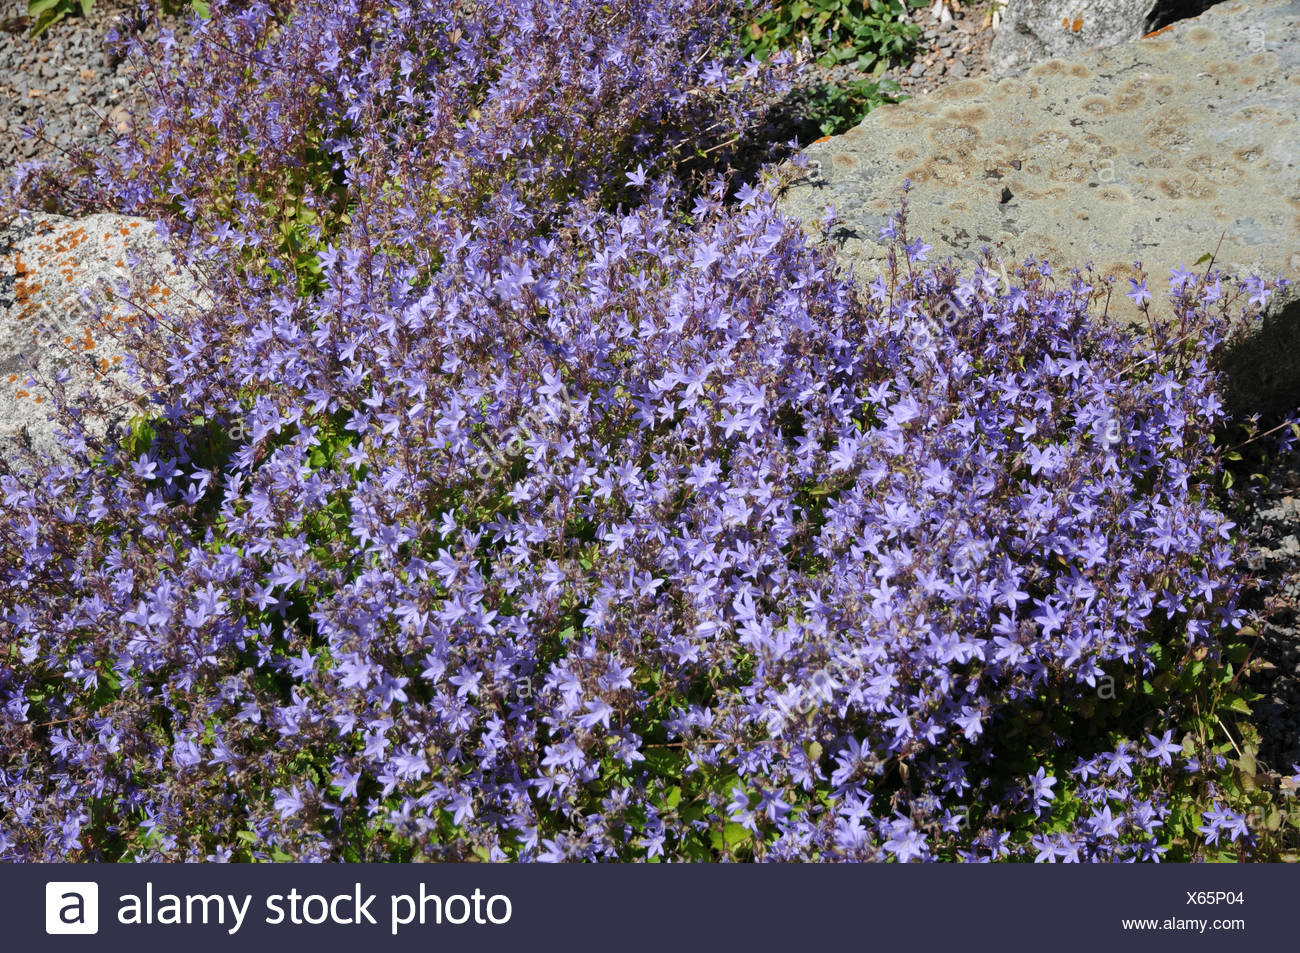 Adriatic bellflower - Stock Image